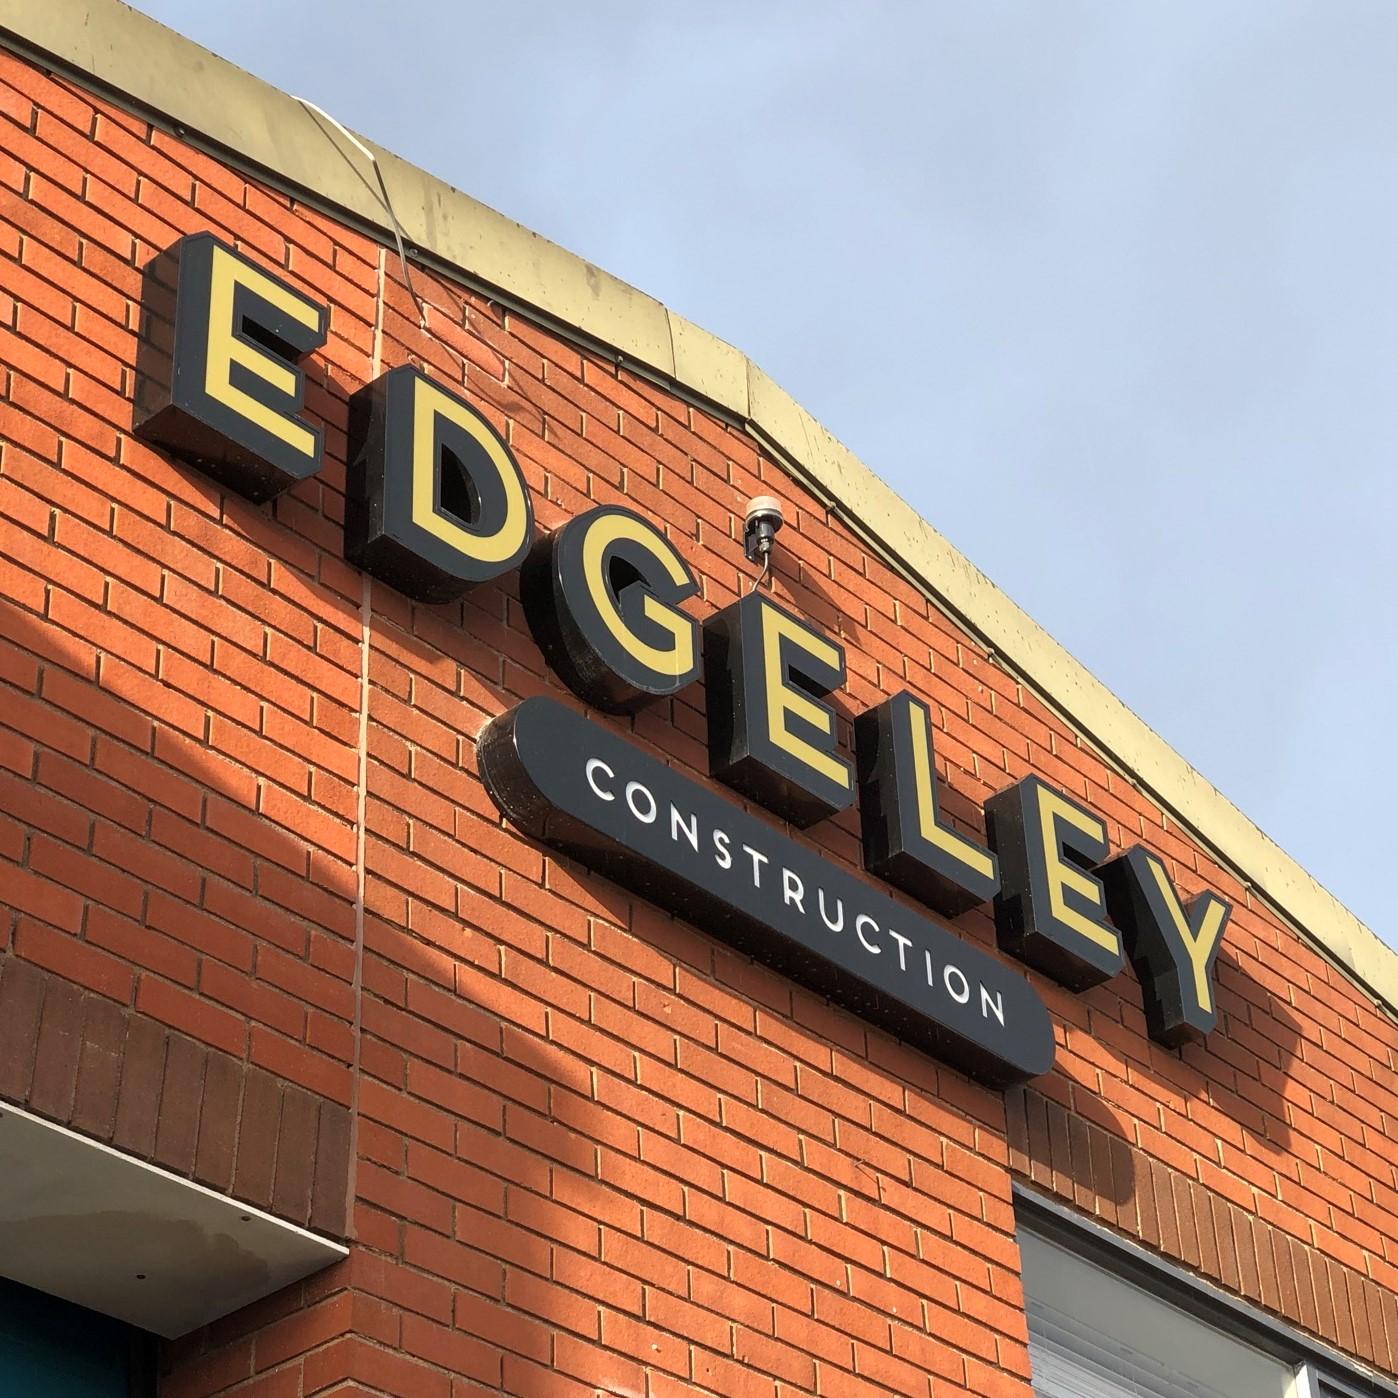 EDGLEY CONSTRUCTION